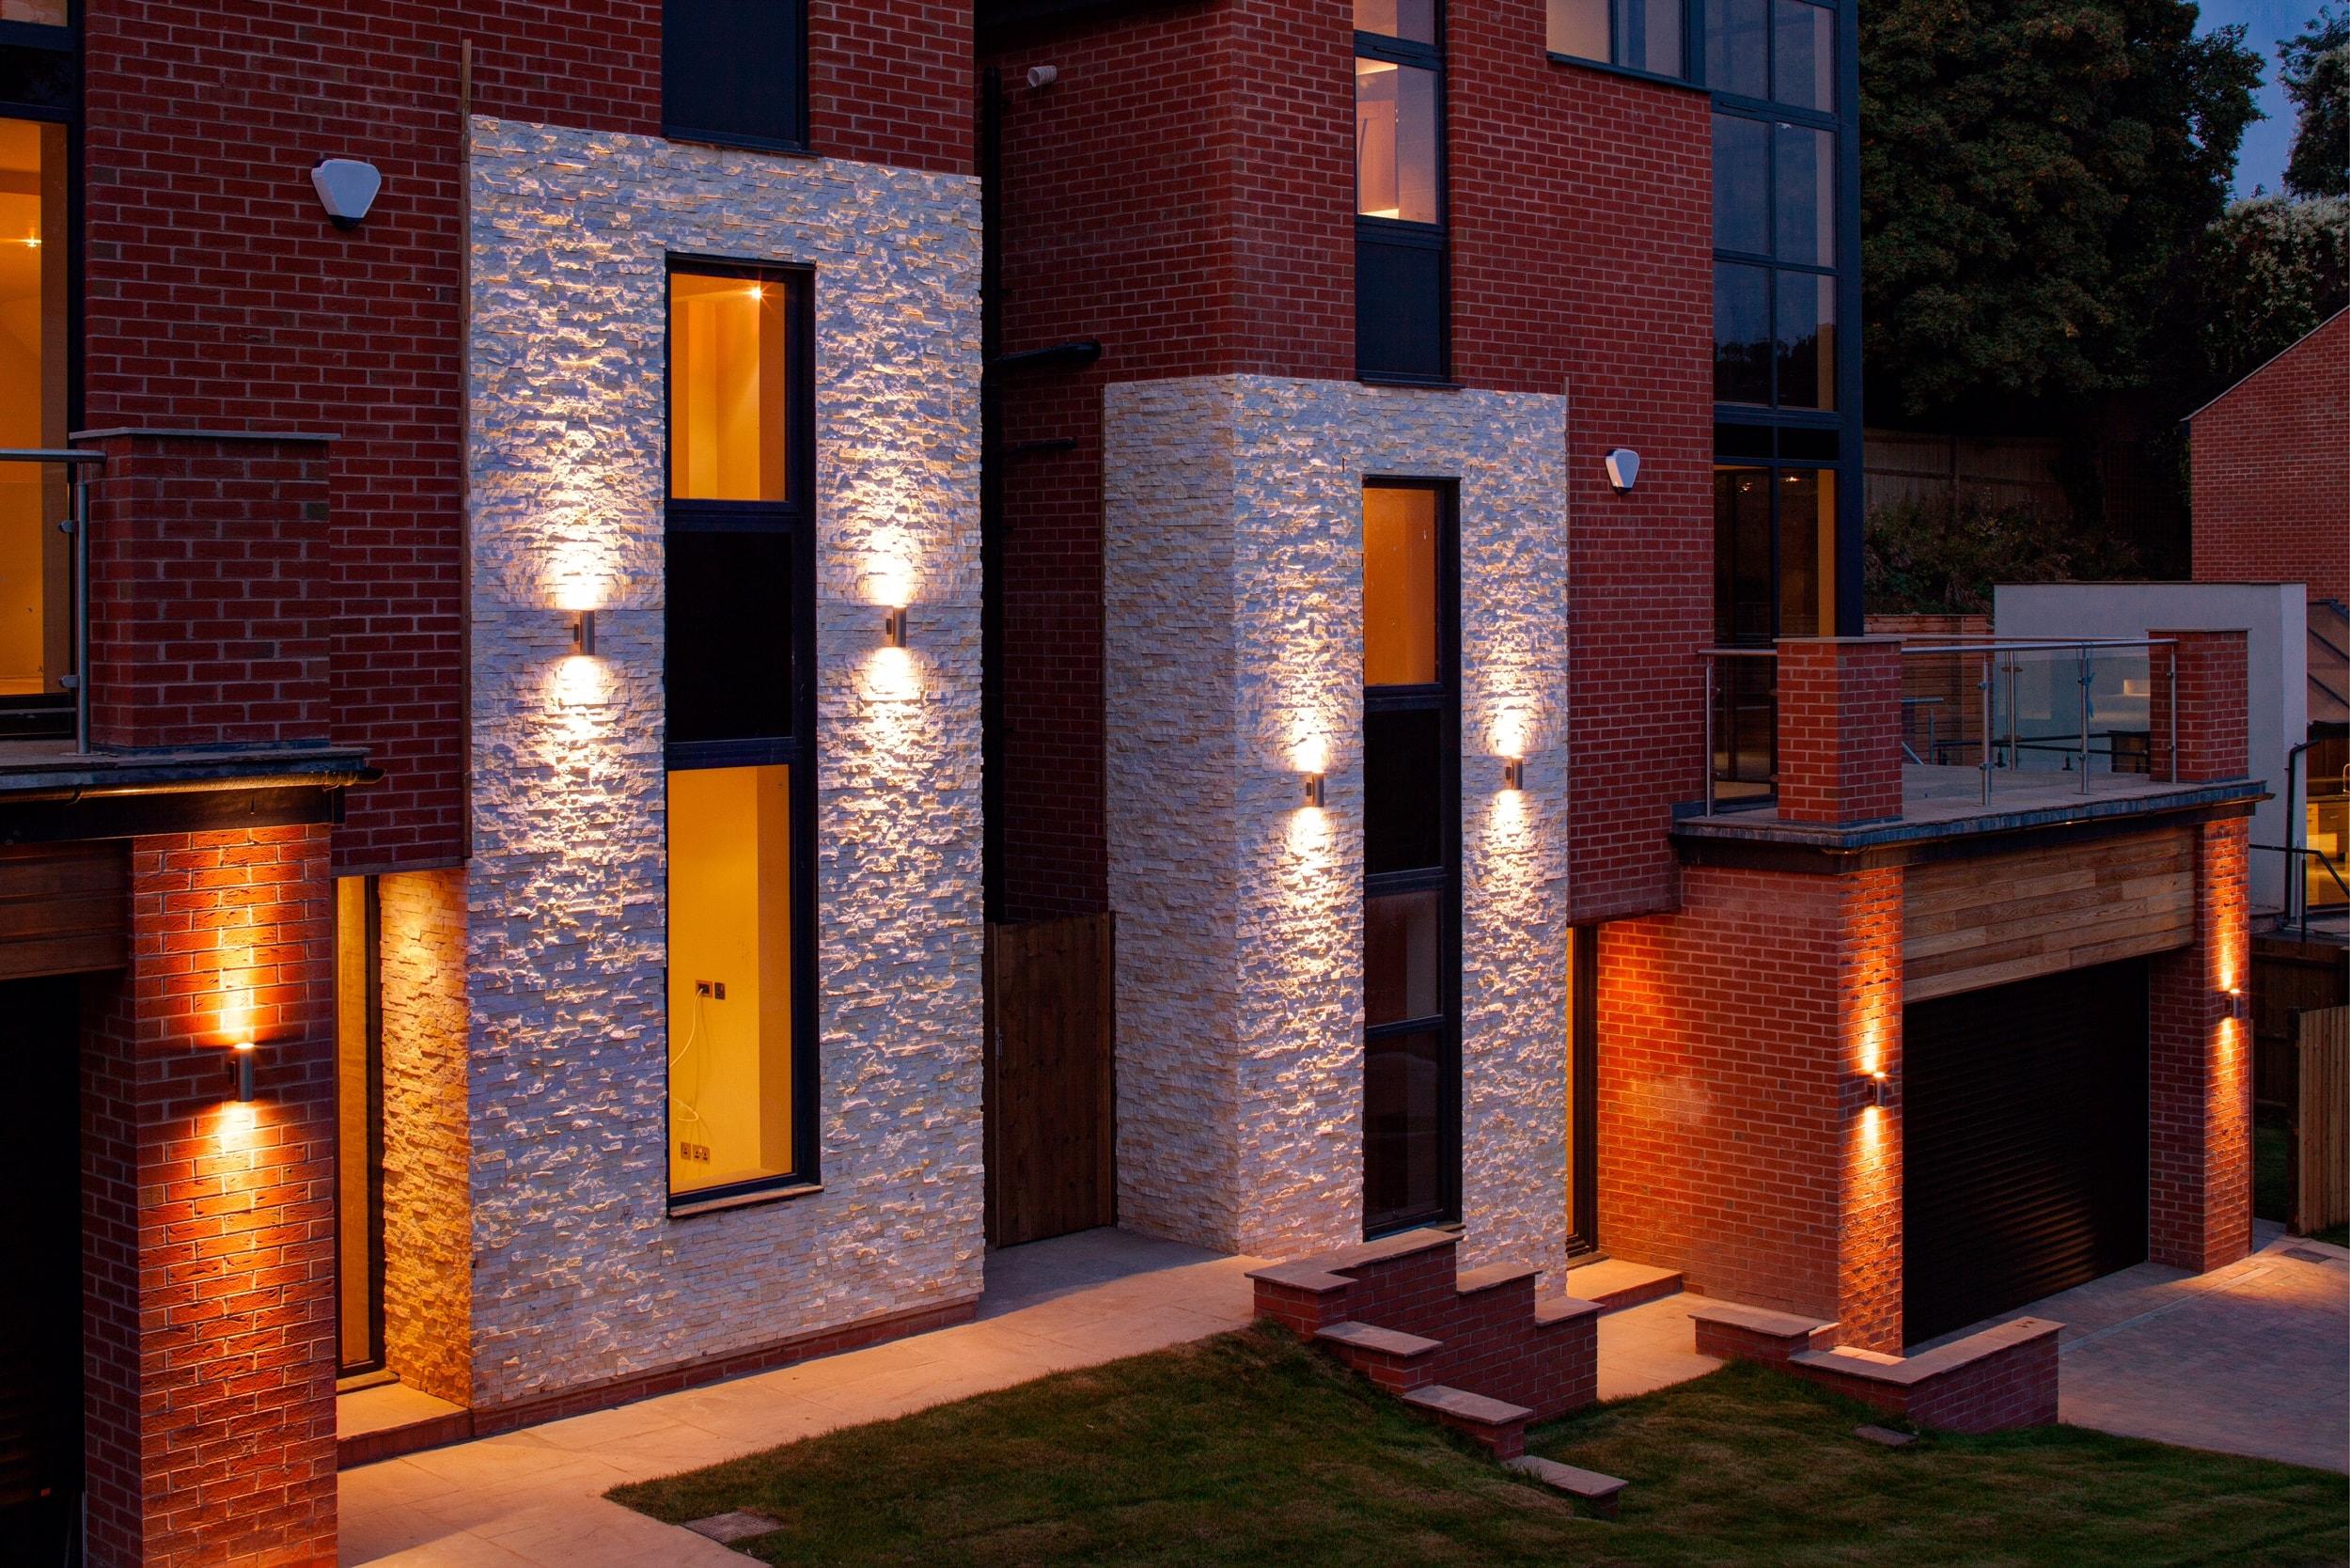 Alexandra park luxury housing development, Nottingham by Guy Phoenix